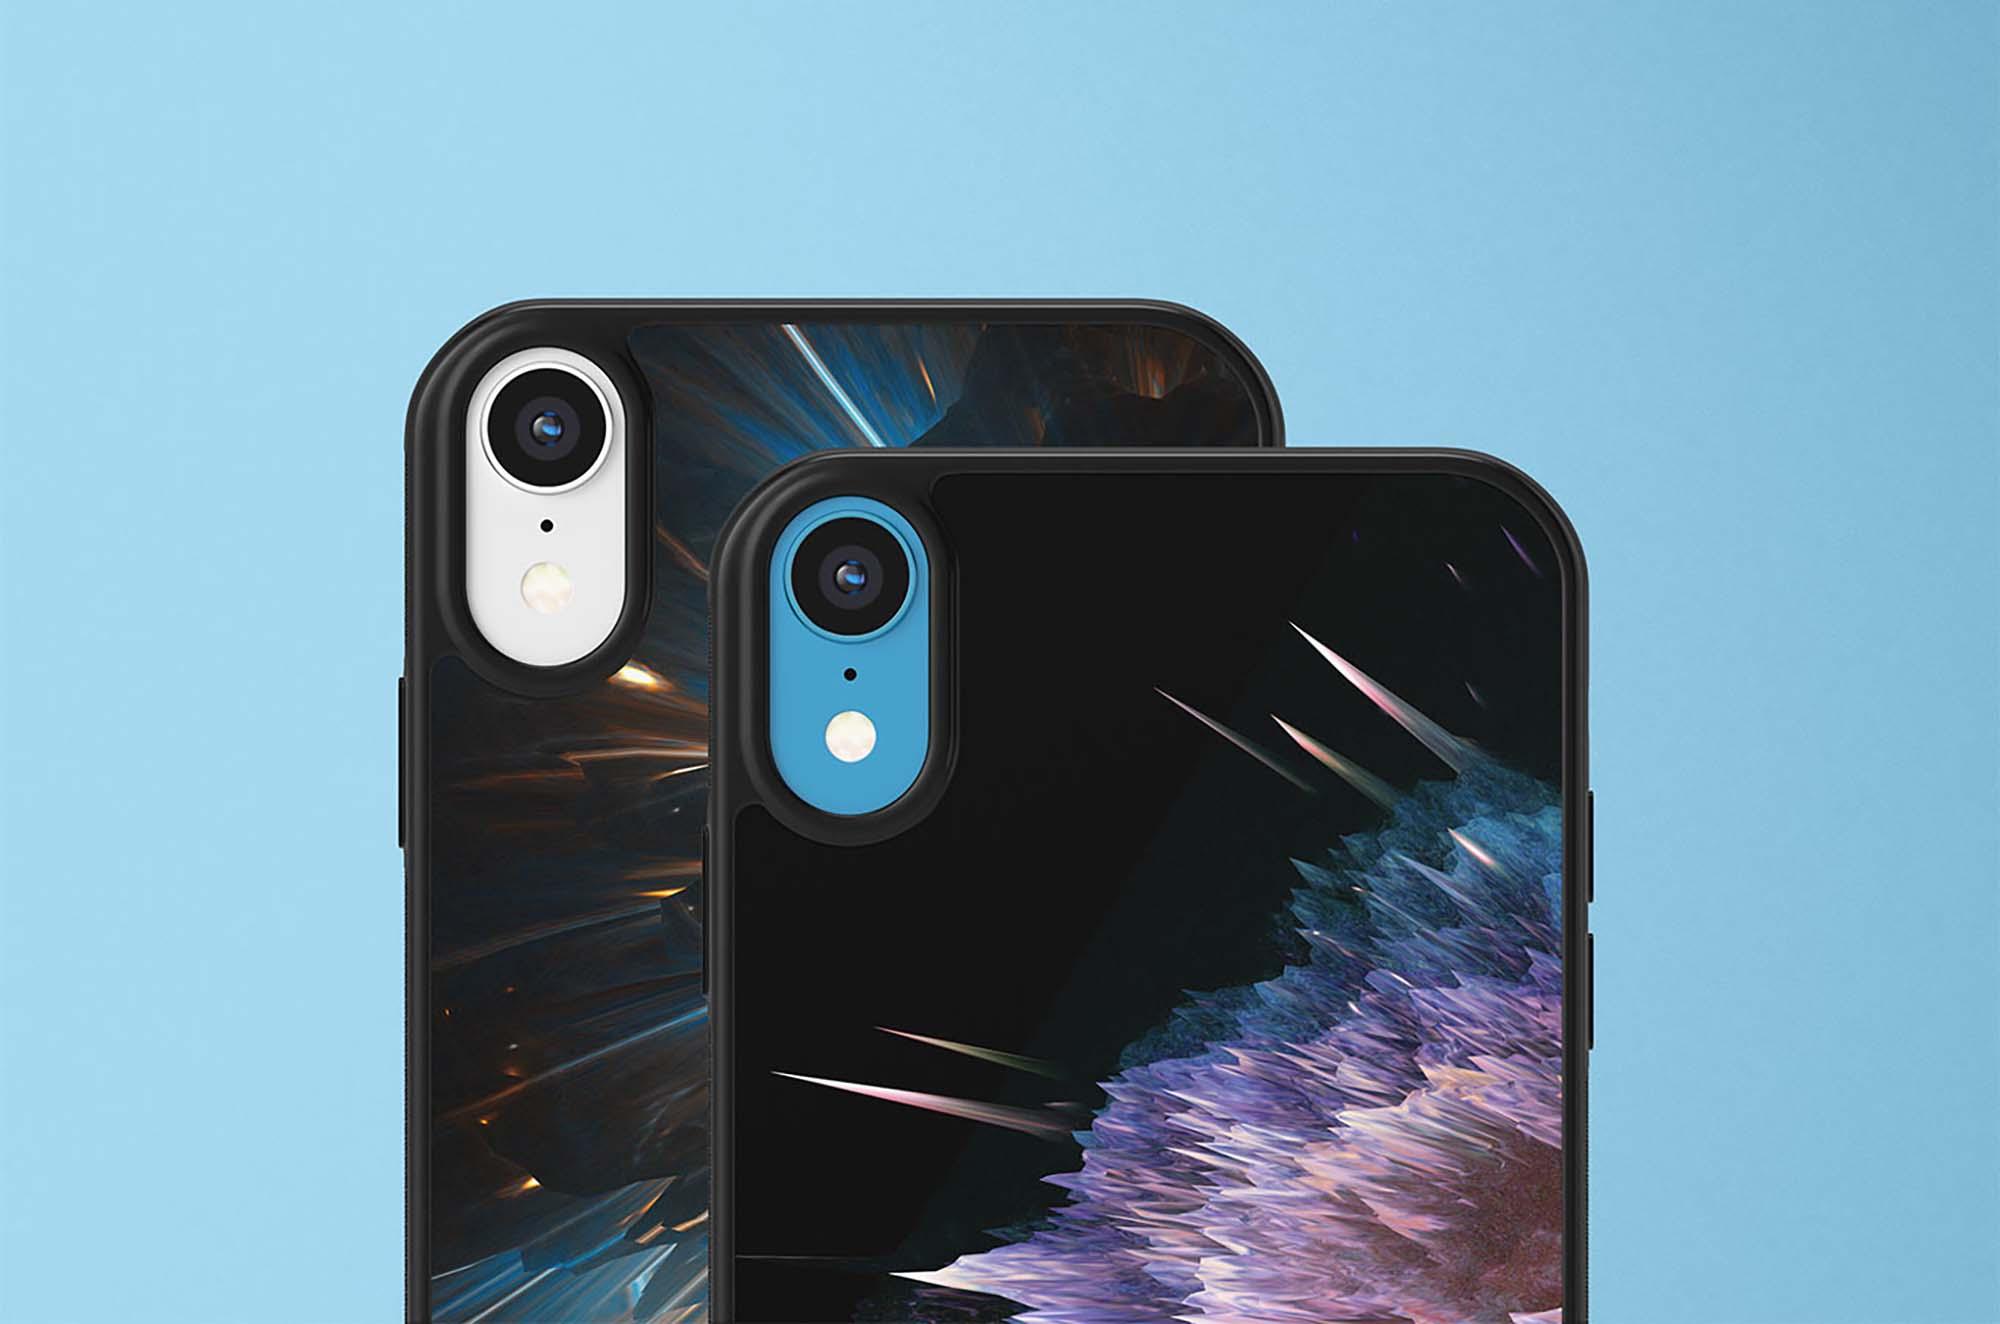 iPhone XR Case Mockup 1